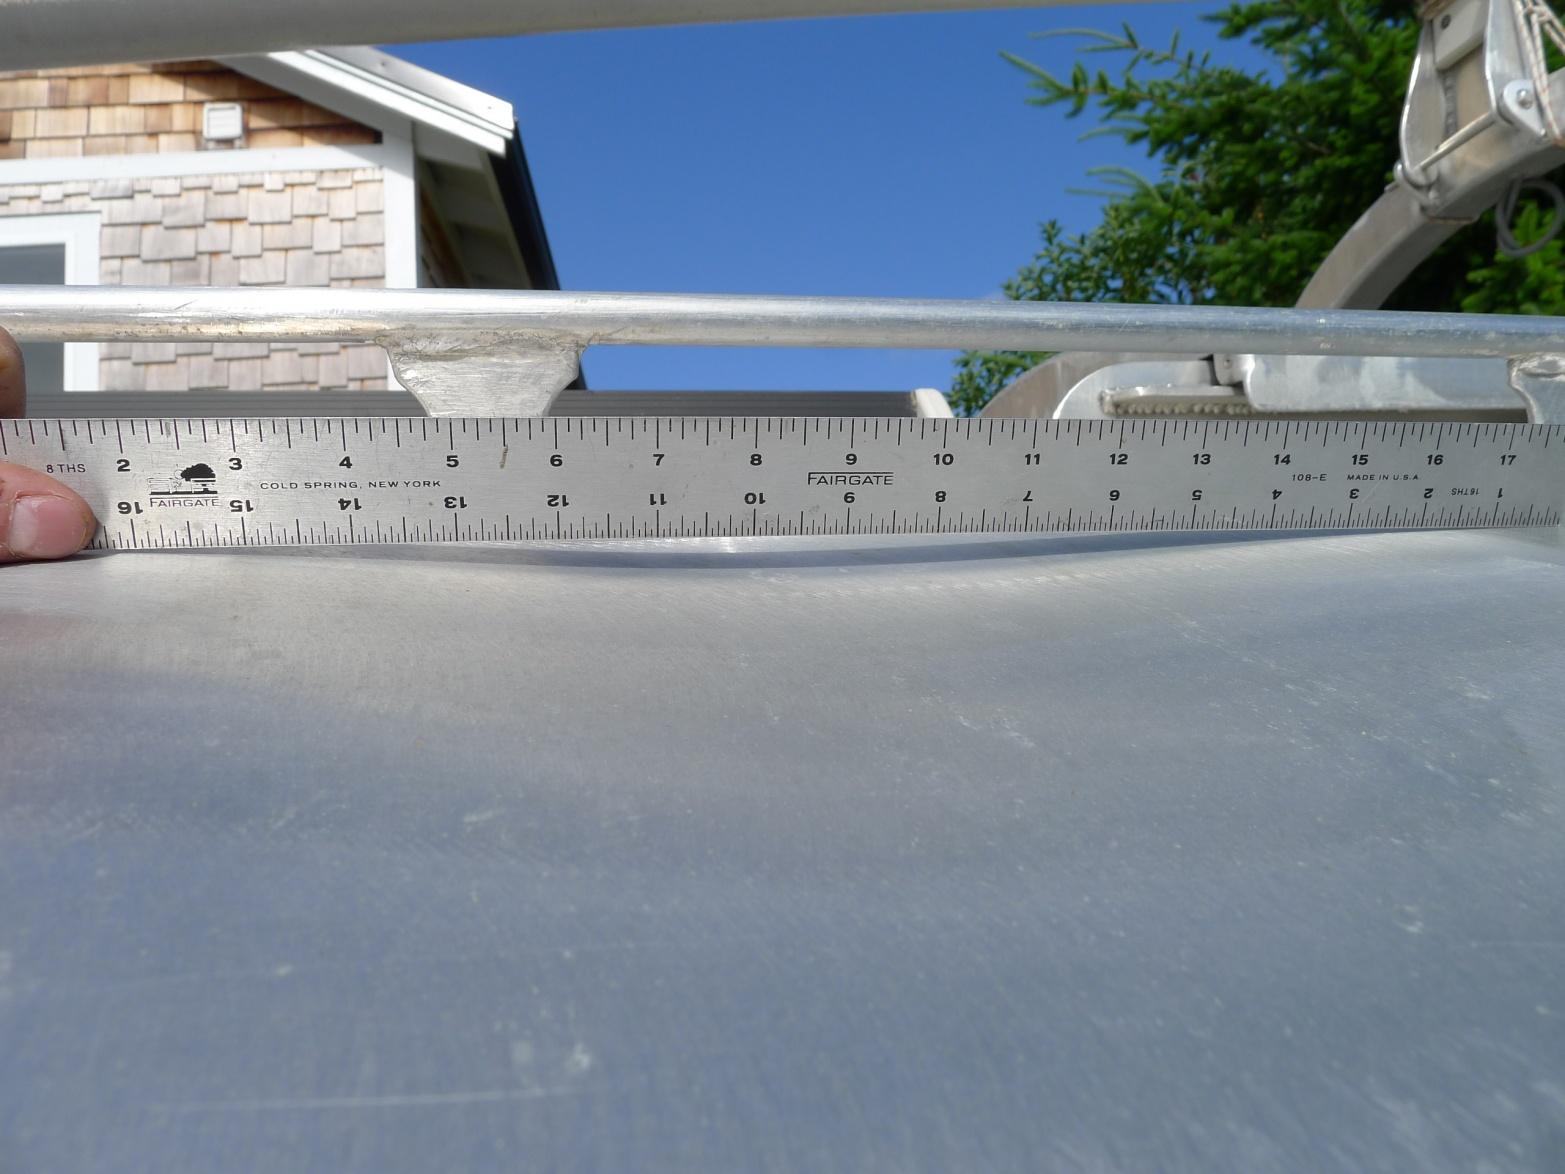 Click image for larger version  Name:Bad craftsmanship 018.jpg Views:78 Size:400.9 KB ID:78189